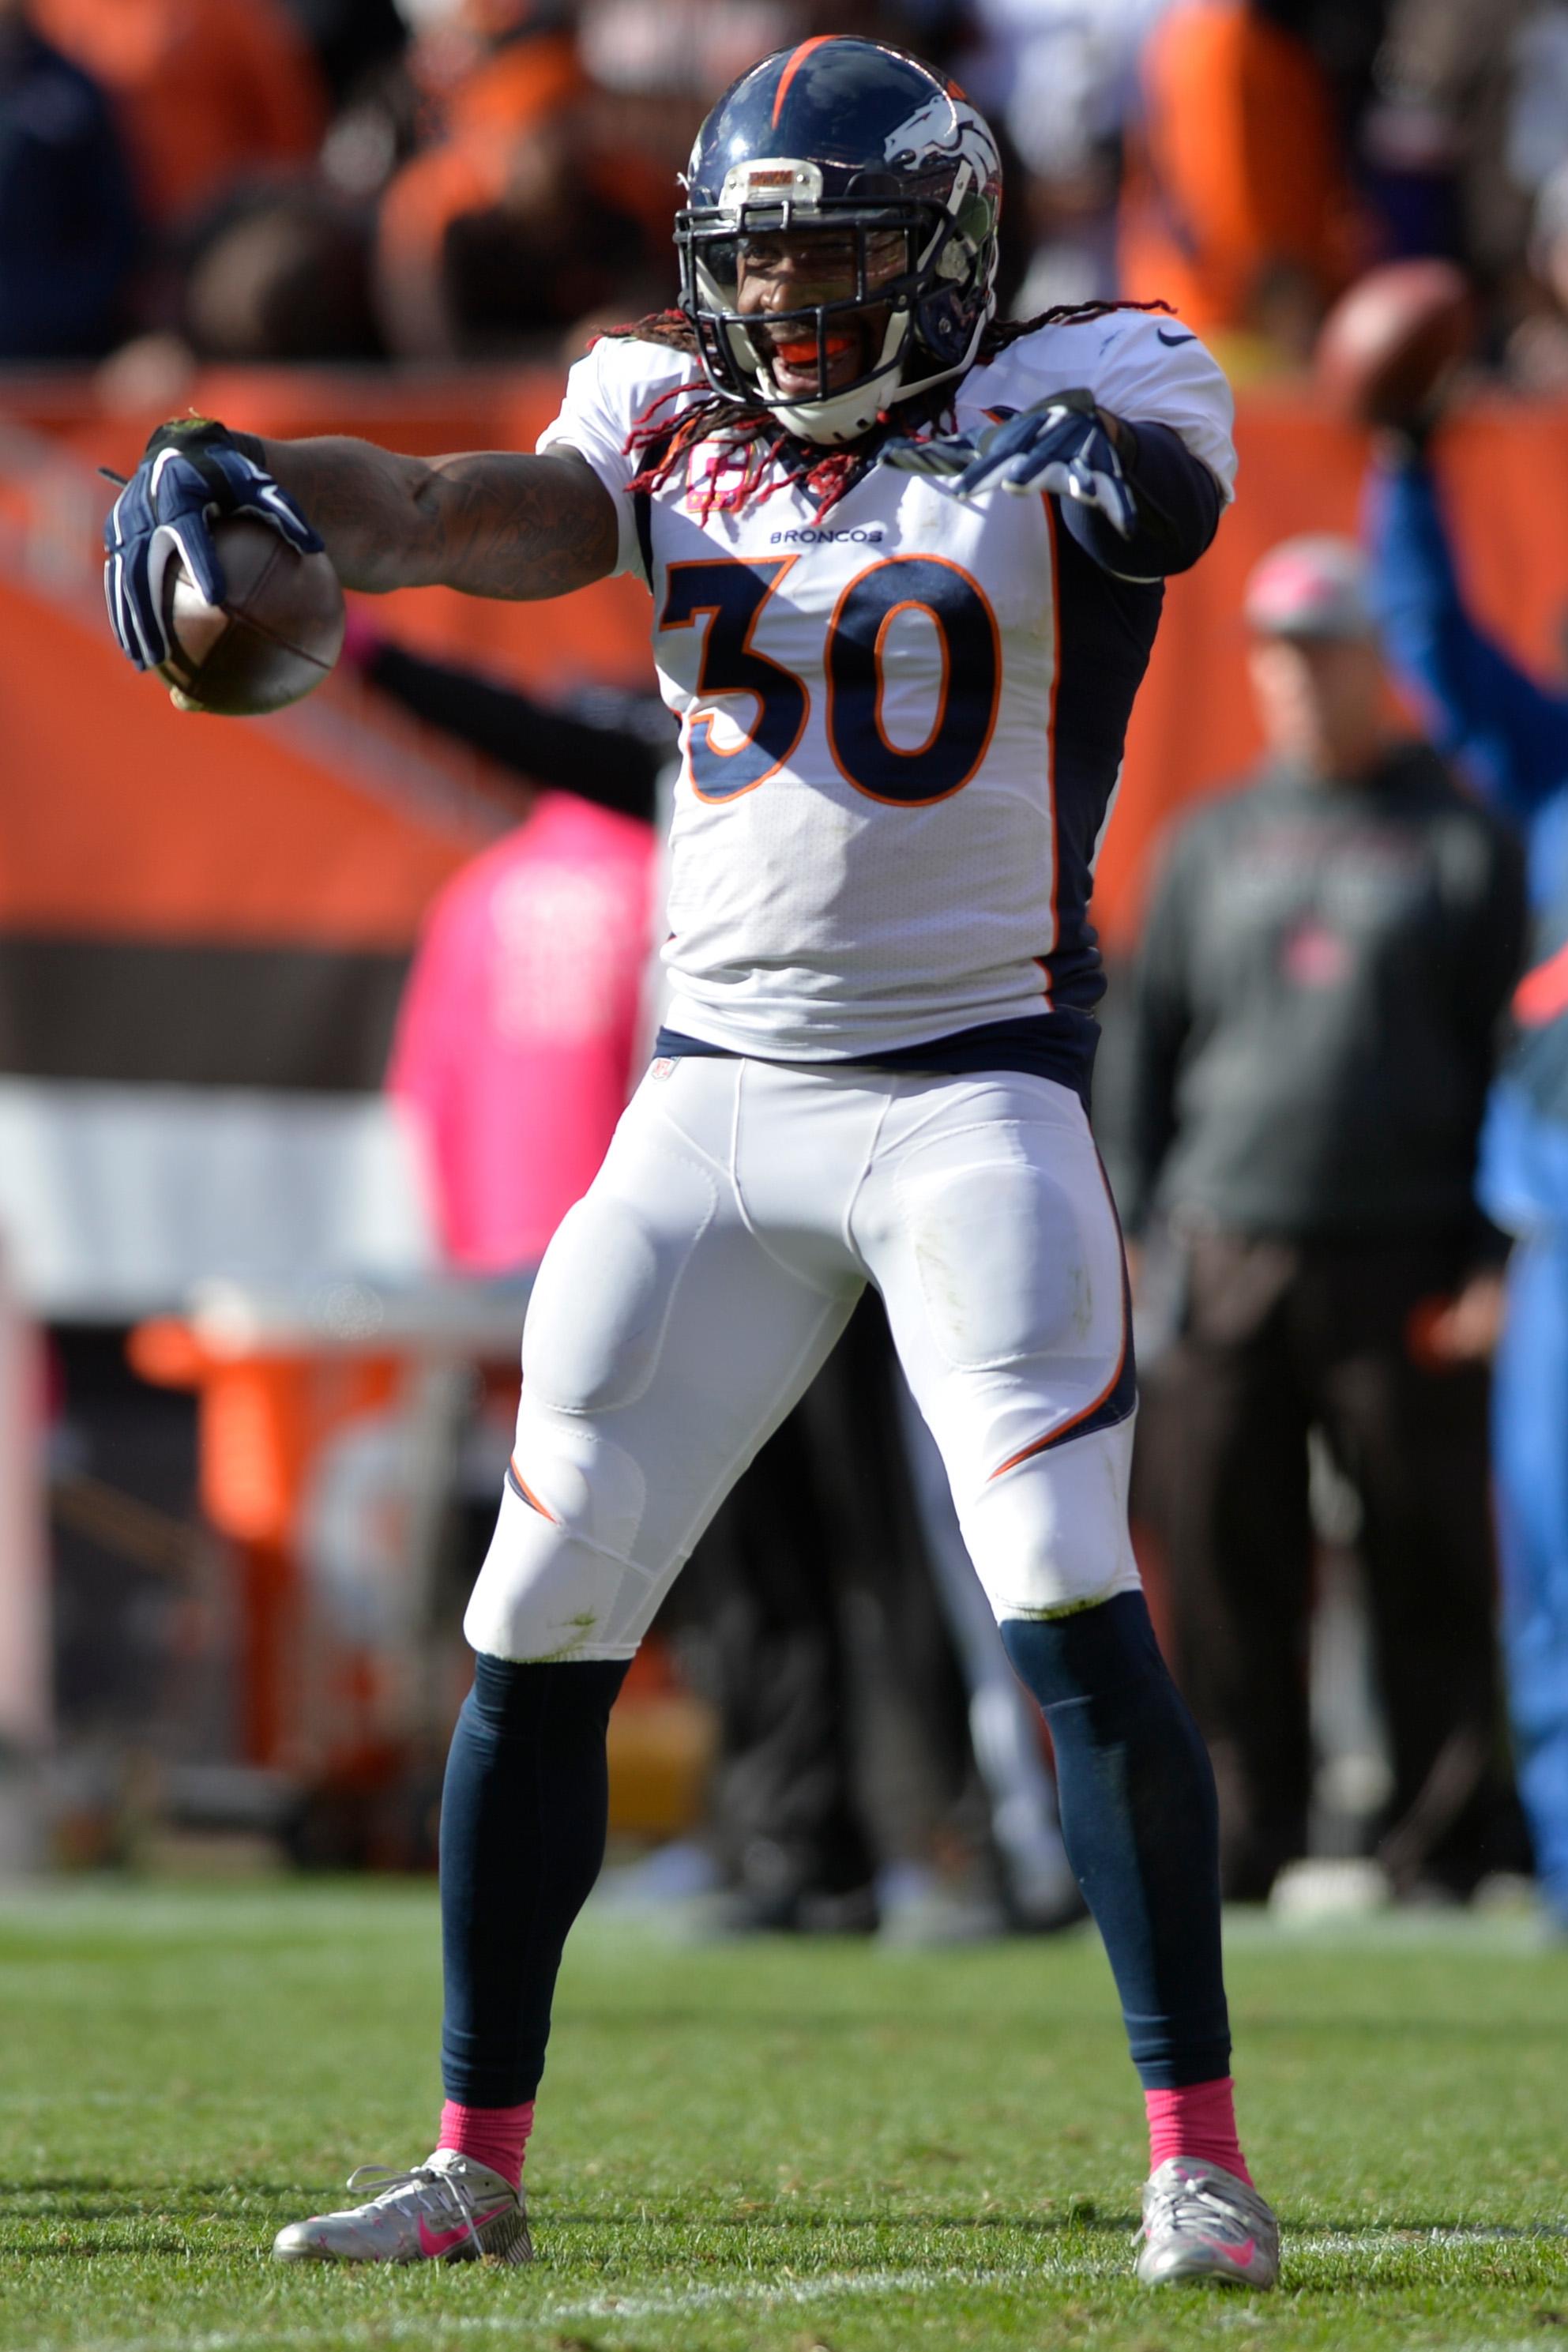 David Bruton Wants To Return To Broncos